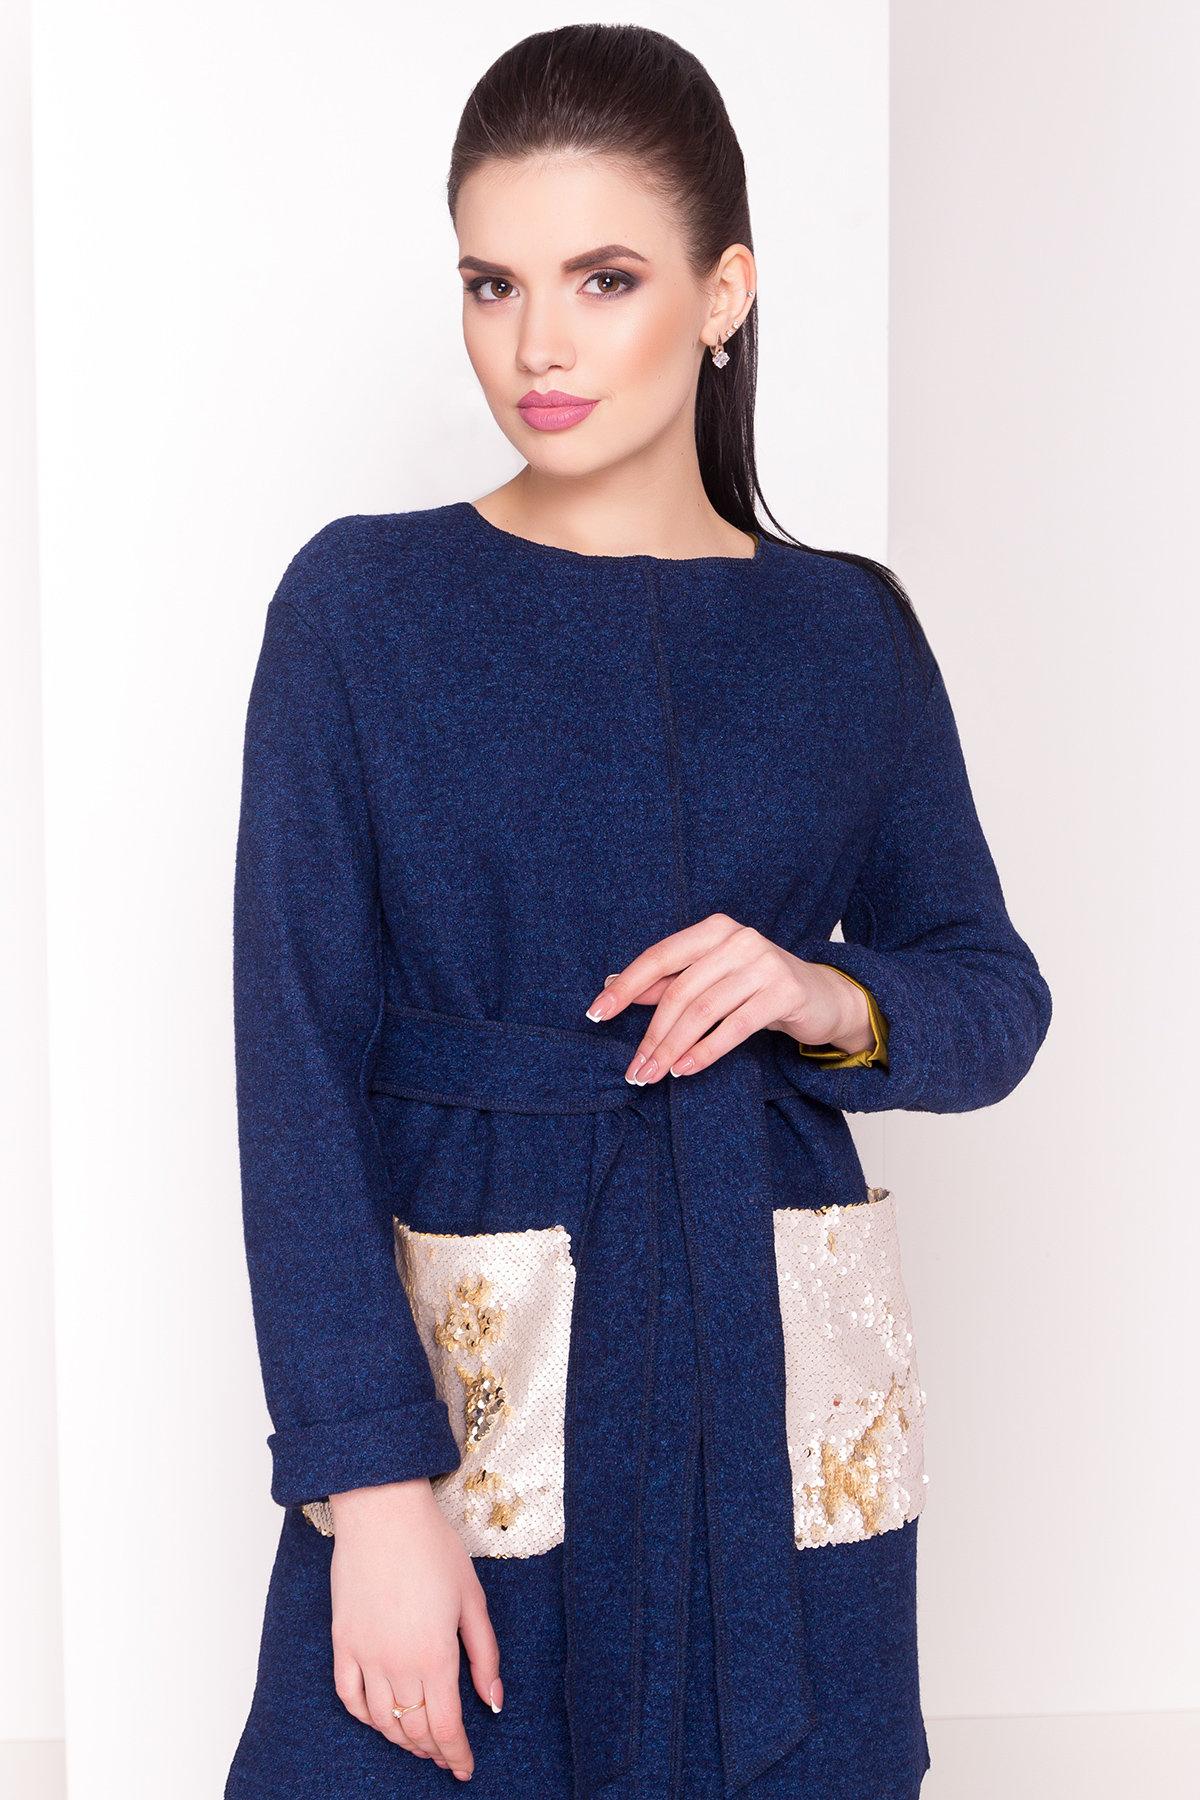 Кардиган с накладными карманами Нуар 4731 Цвет: Темно-синий/электрик-LW27